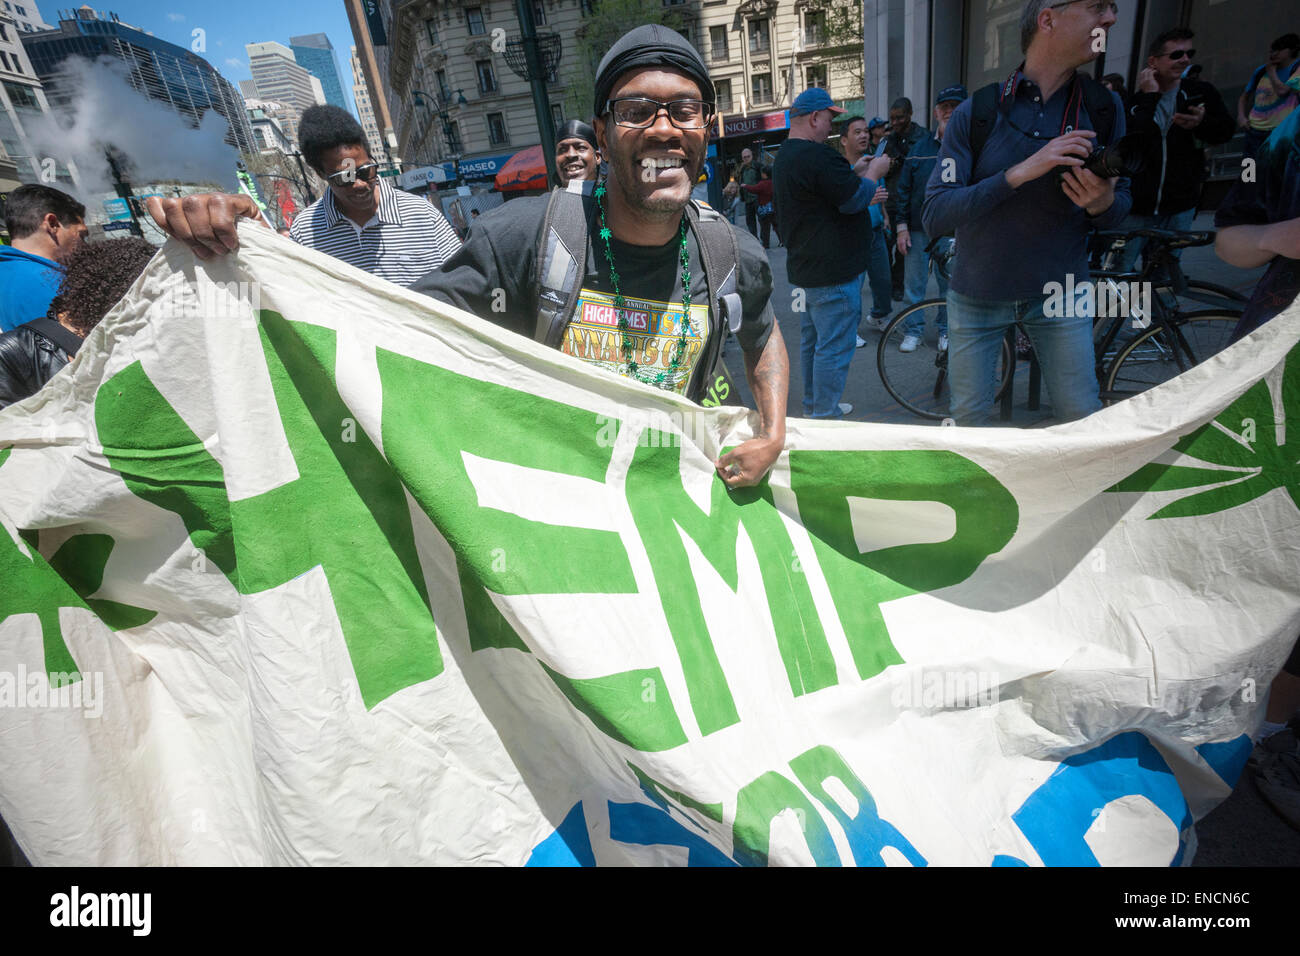 New York, USA. 2 mai, 2015. Les défenseurs de la légalisation de la marijuana mars à New York, le Photo Stock